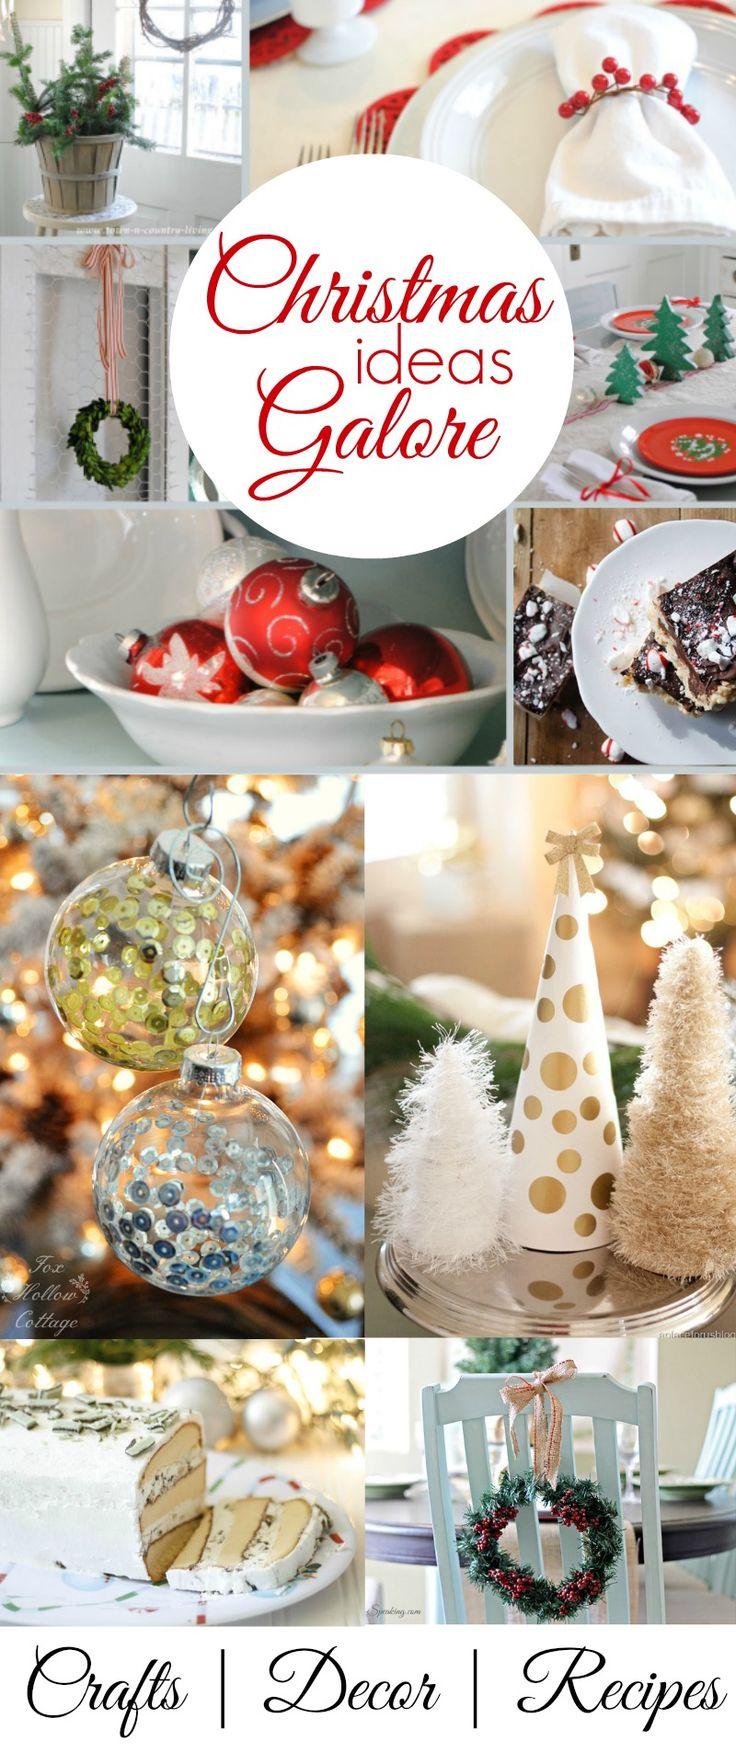 Christmas Diy: Decor Crafts Dessert Recipes and Ideas | #Christmasideas